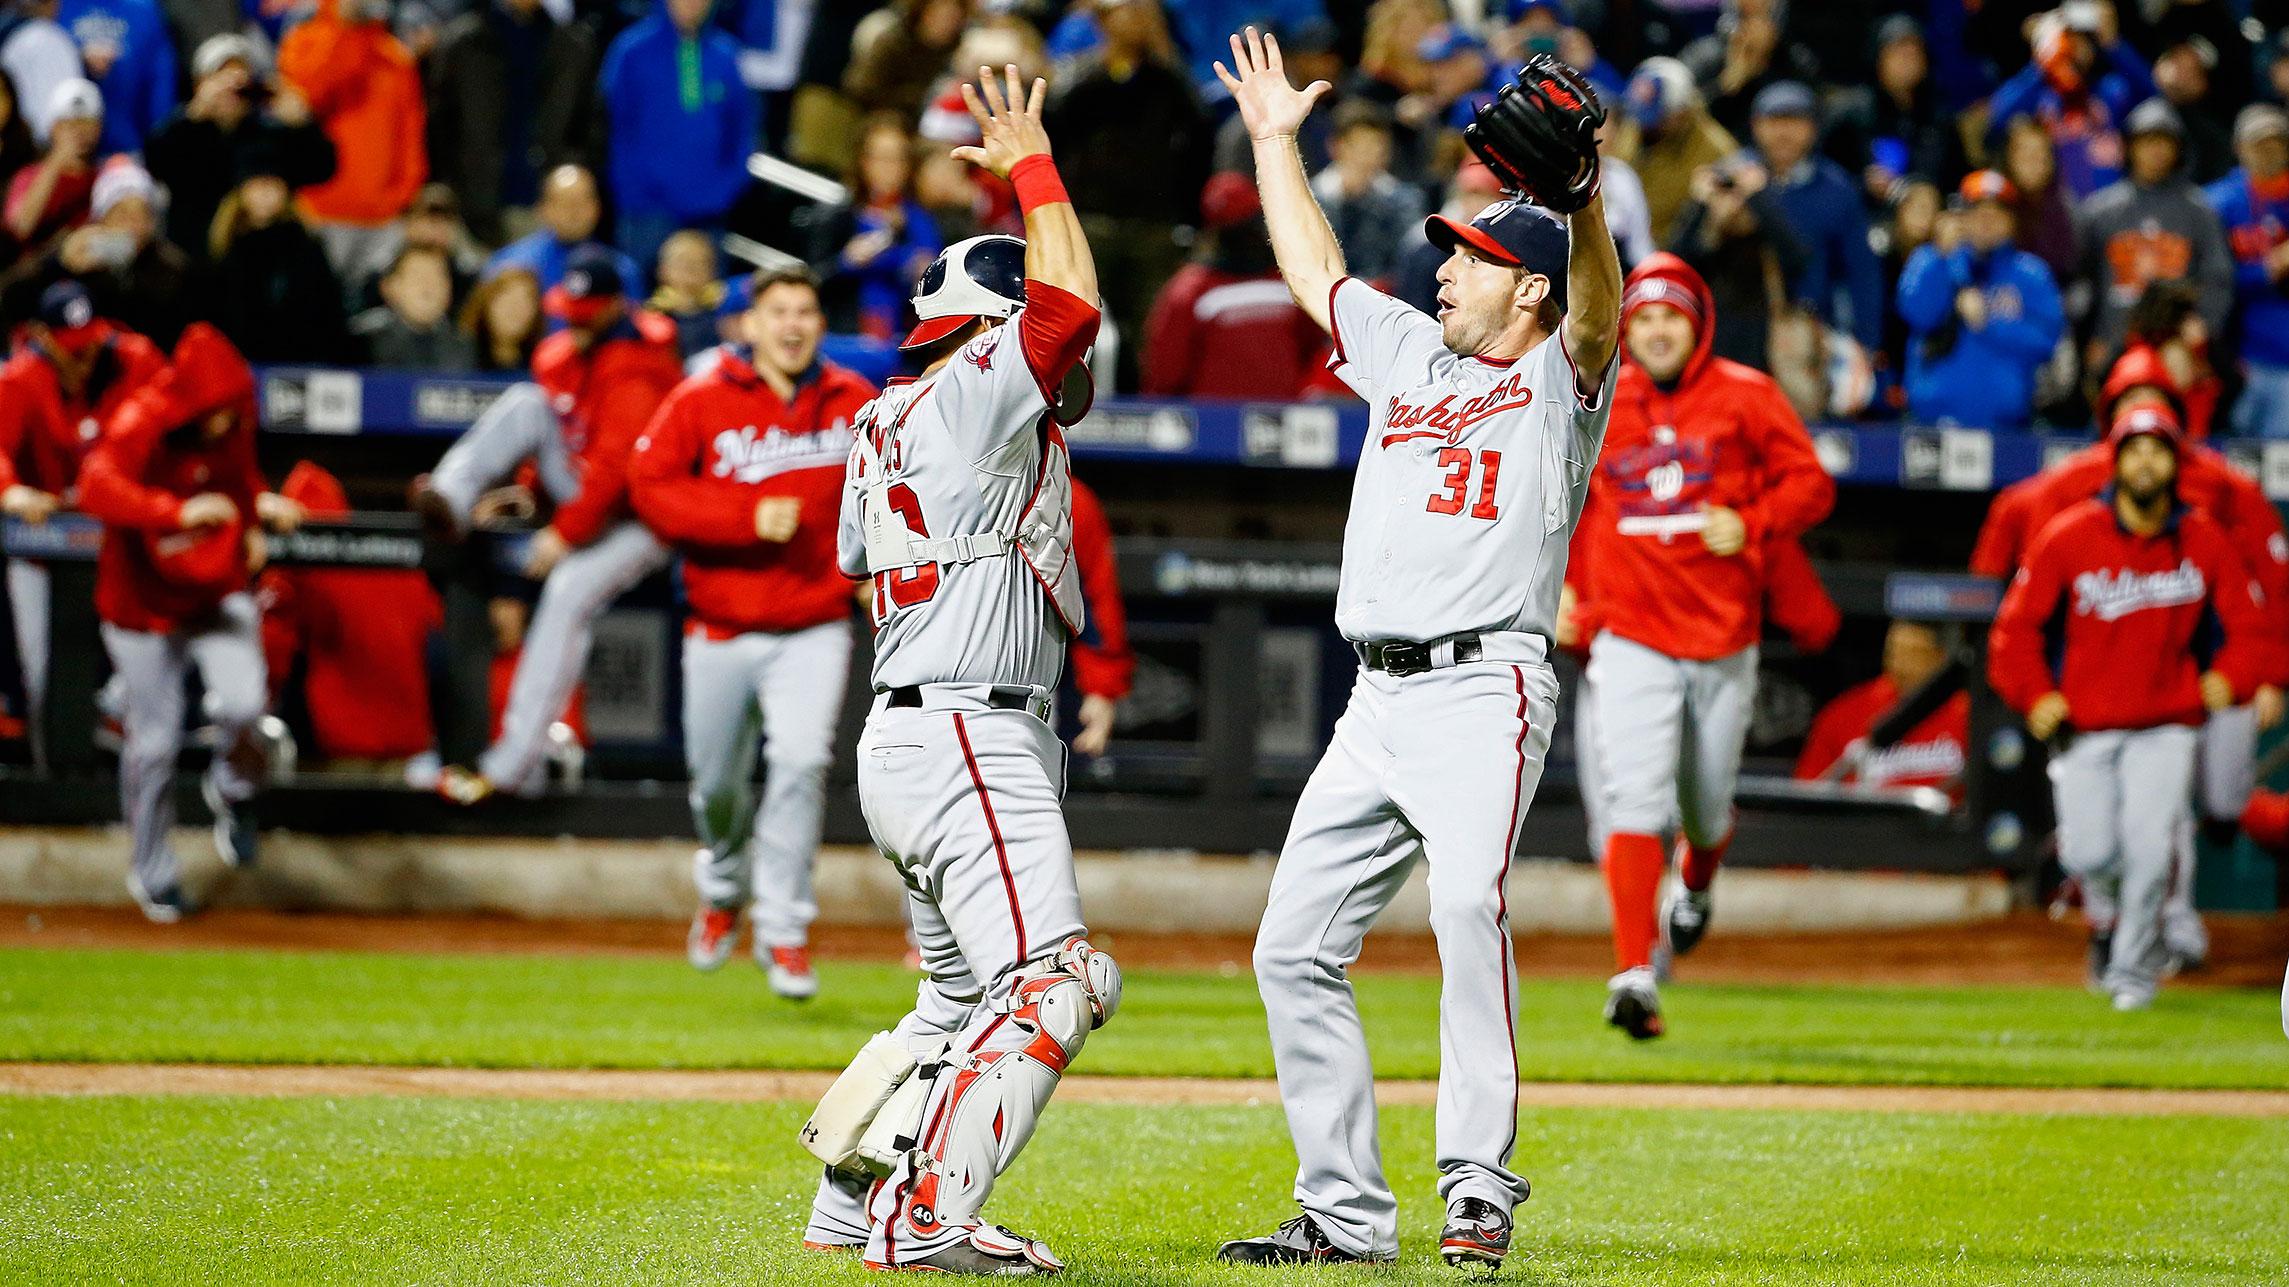 Dan Haren first victory for Cubs//Adam Lind HR 2015 Cubs vs Brewers Ticket